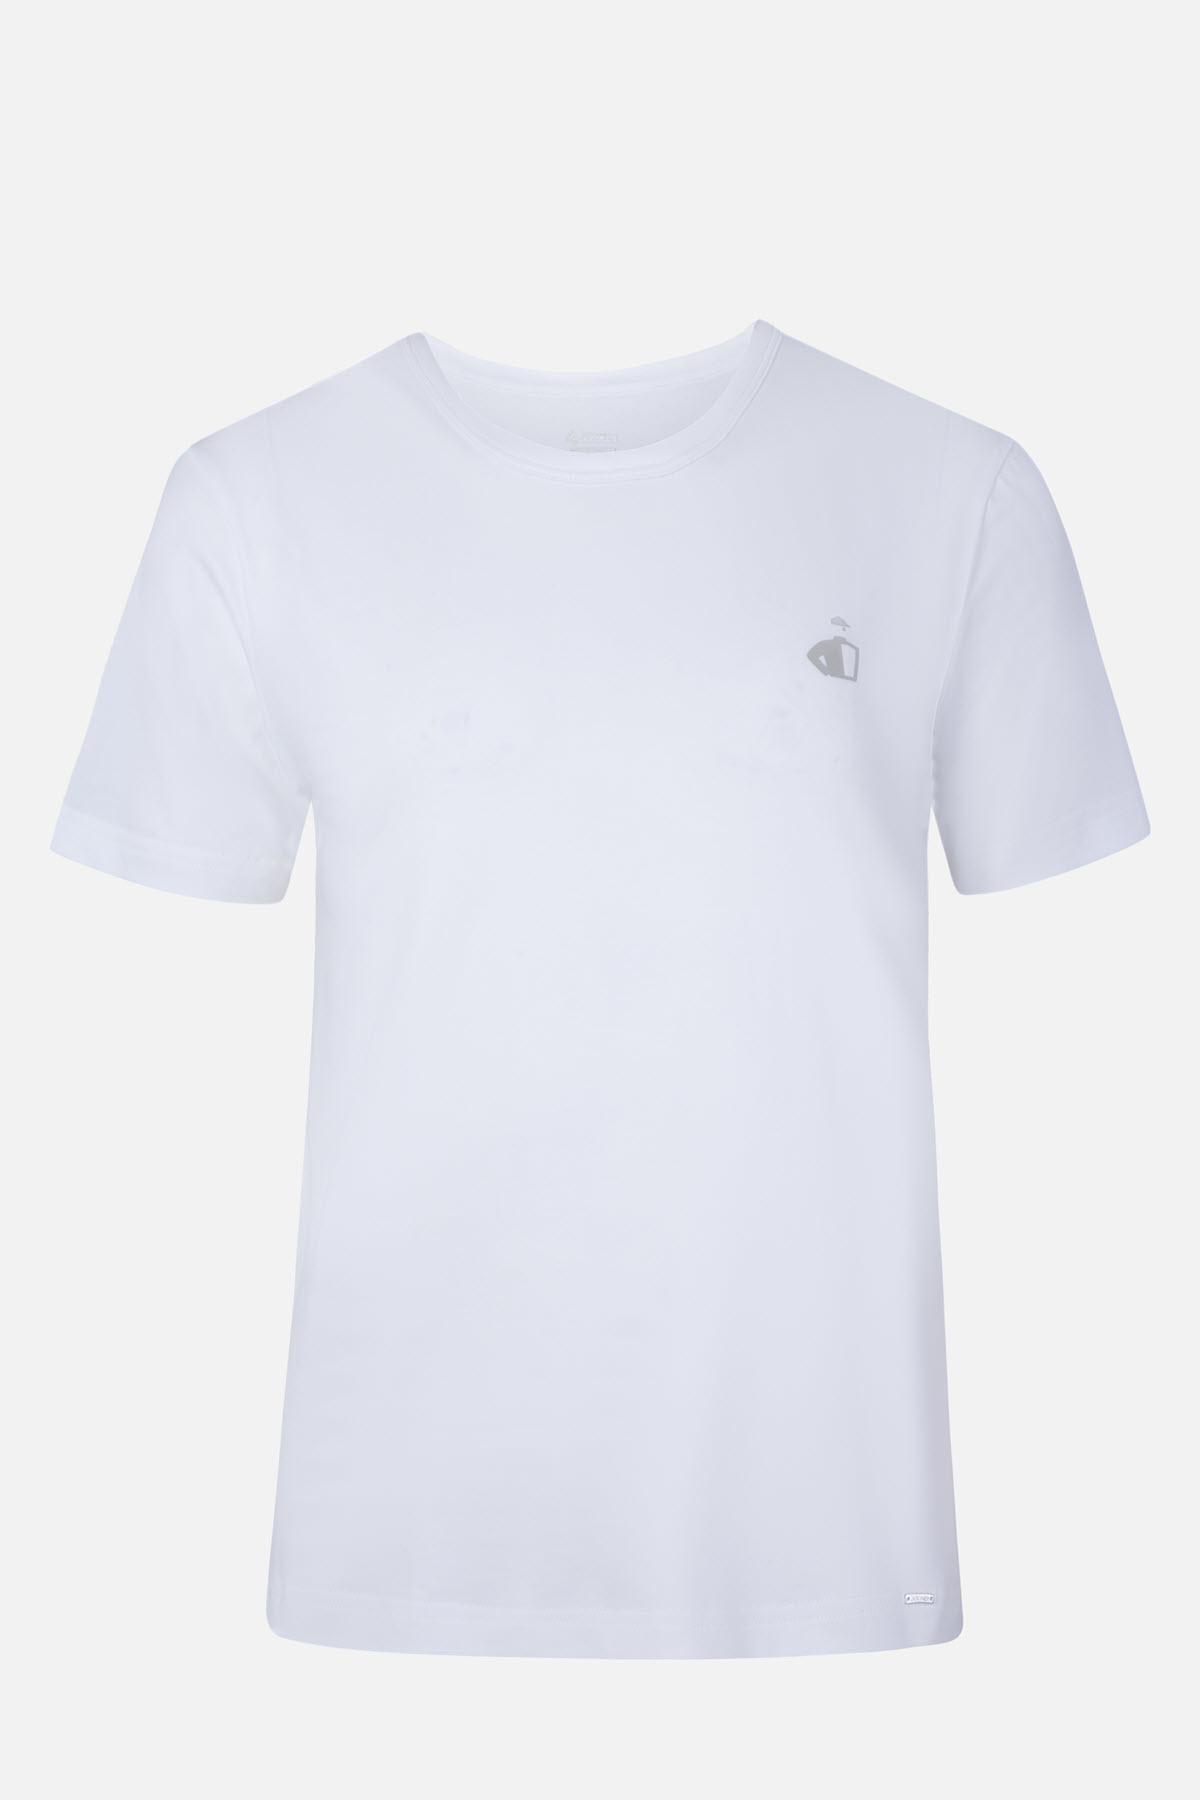 Áo T - Top nam Jockey Cotton compact in Haft boy - 7339